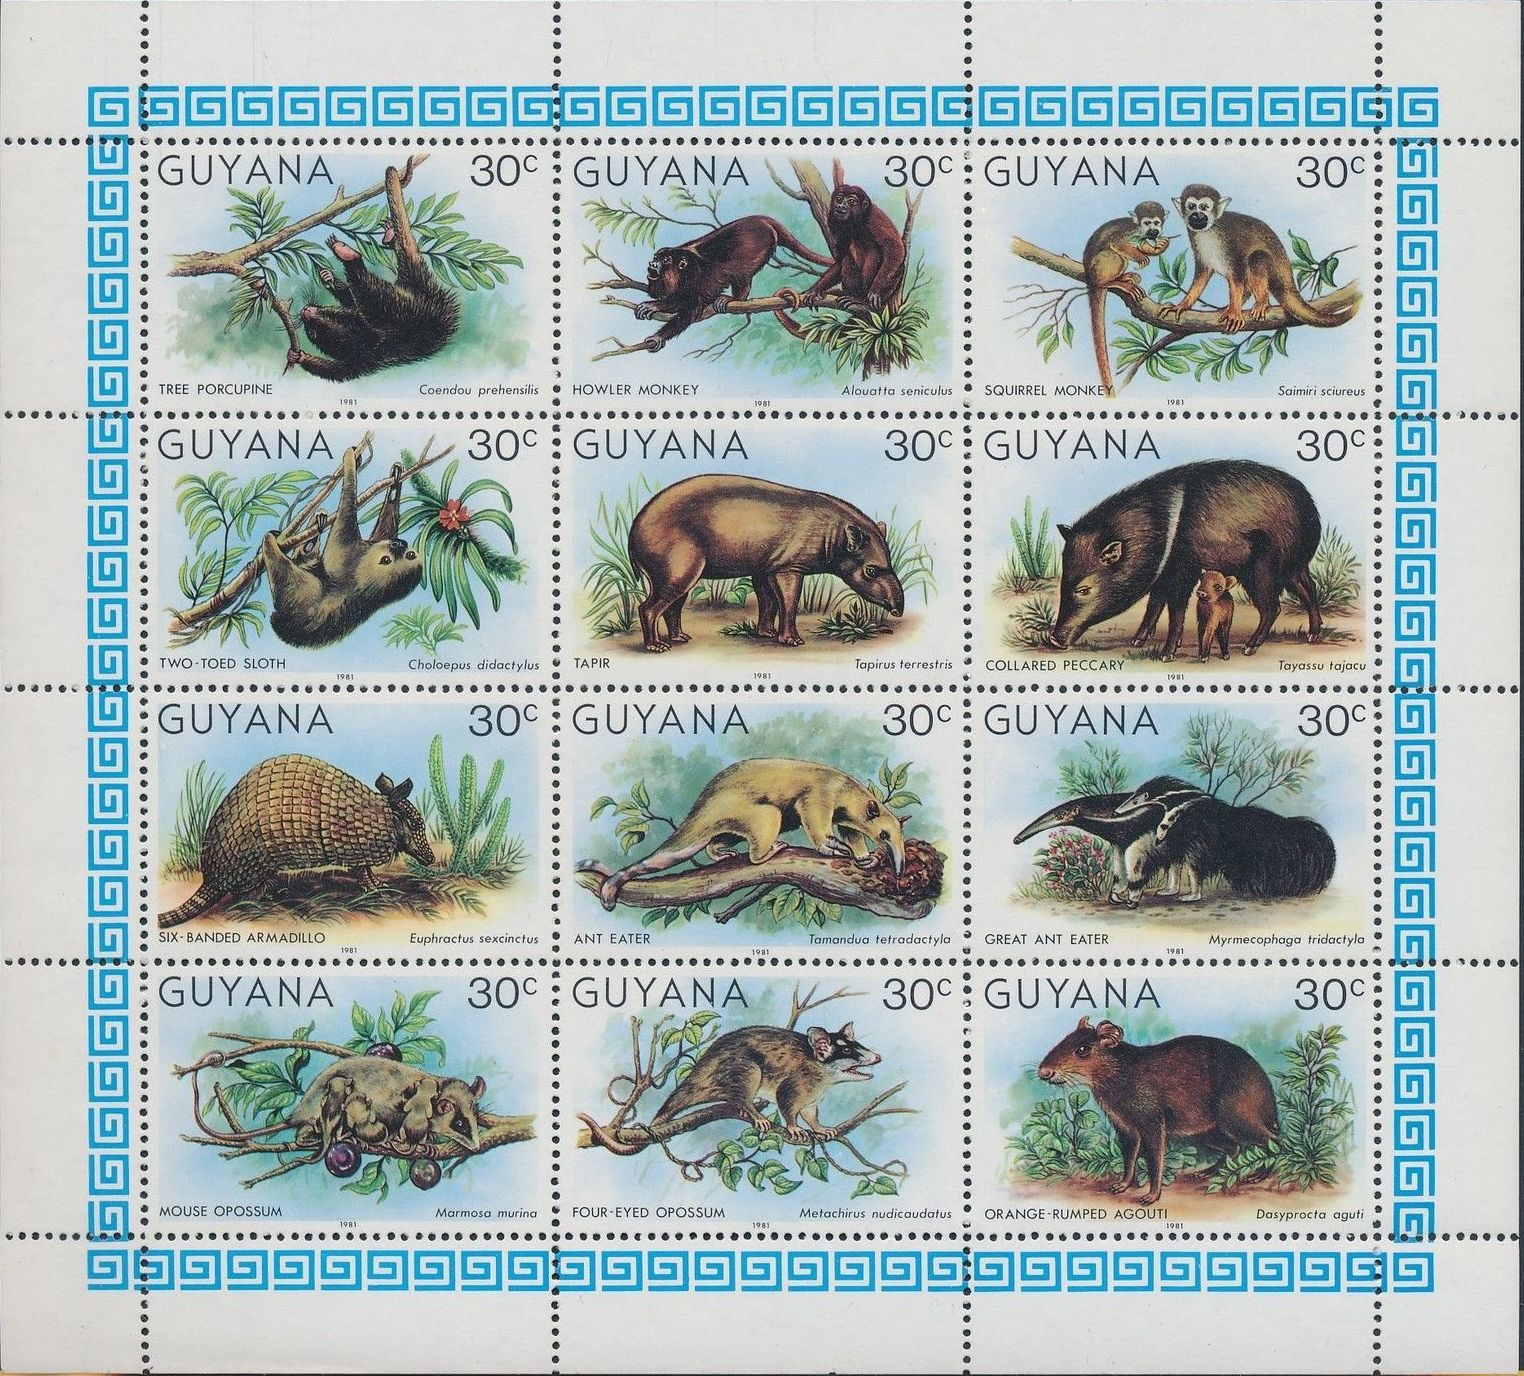 Guyana 1981 Wildlife